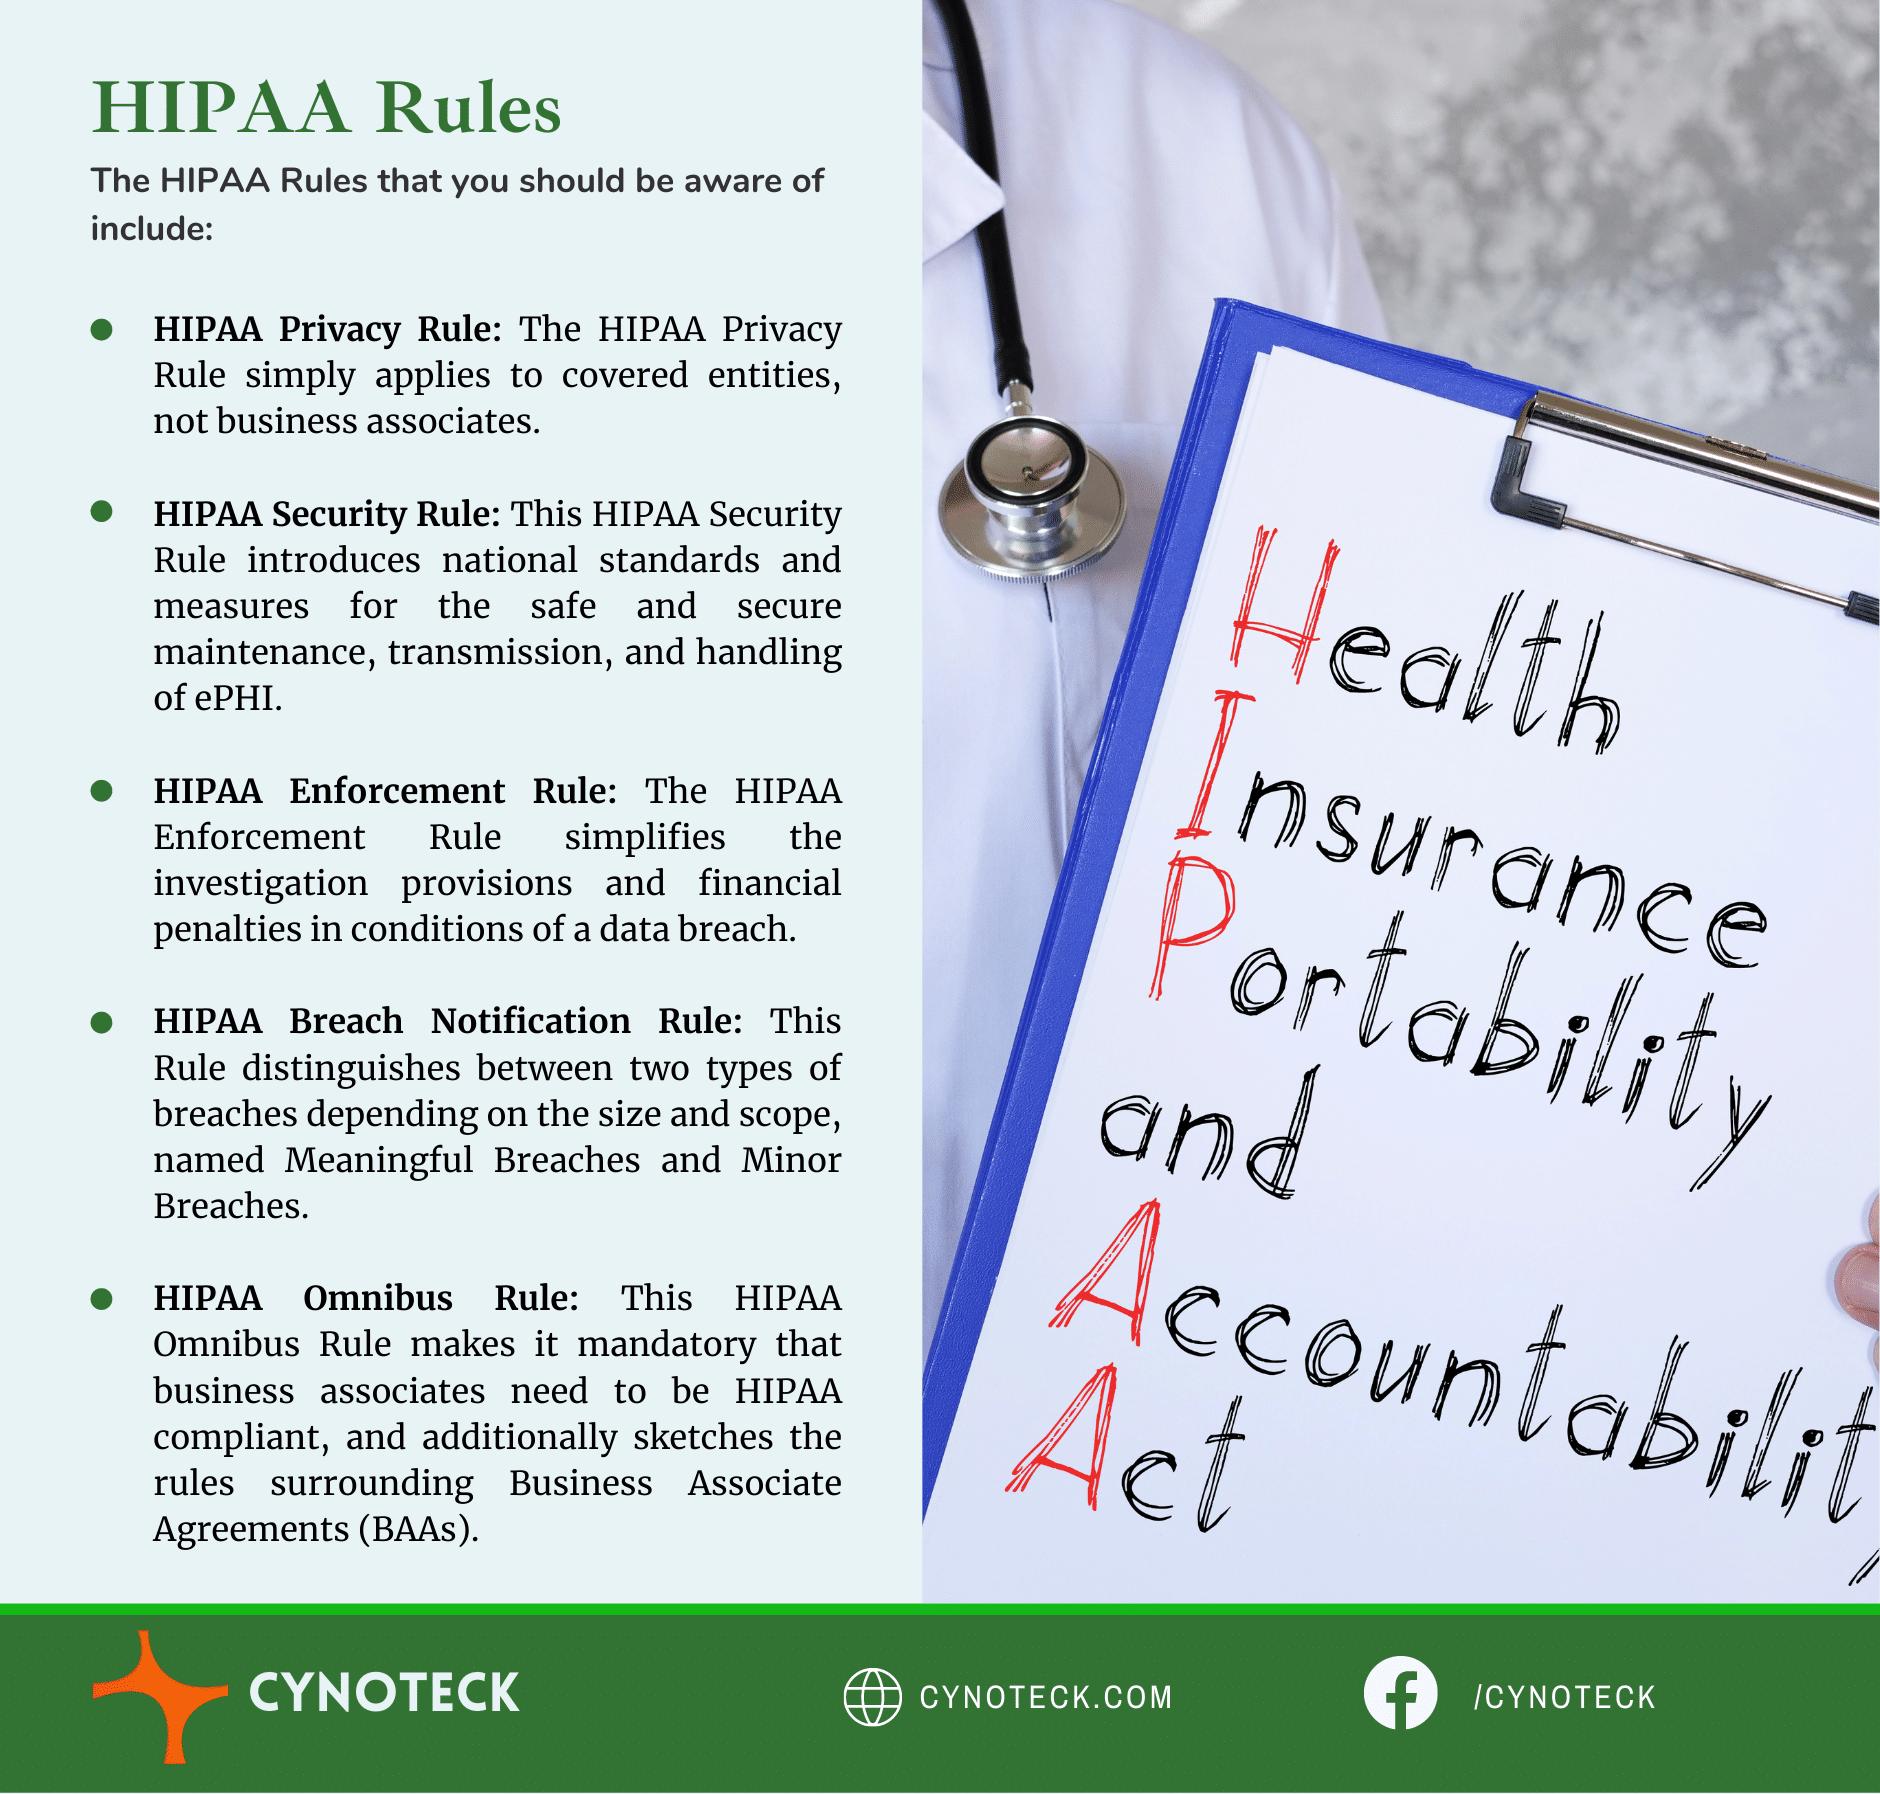 HIPAA Compliance Mean